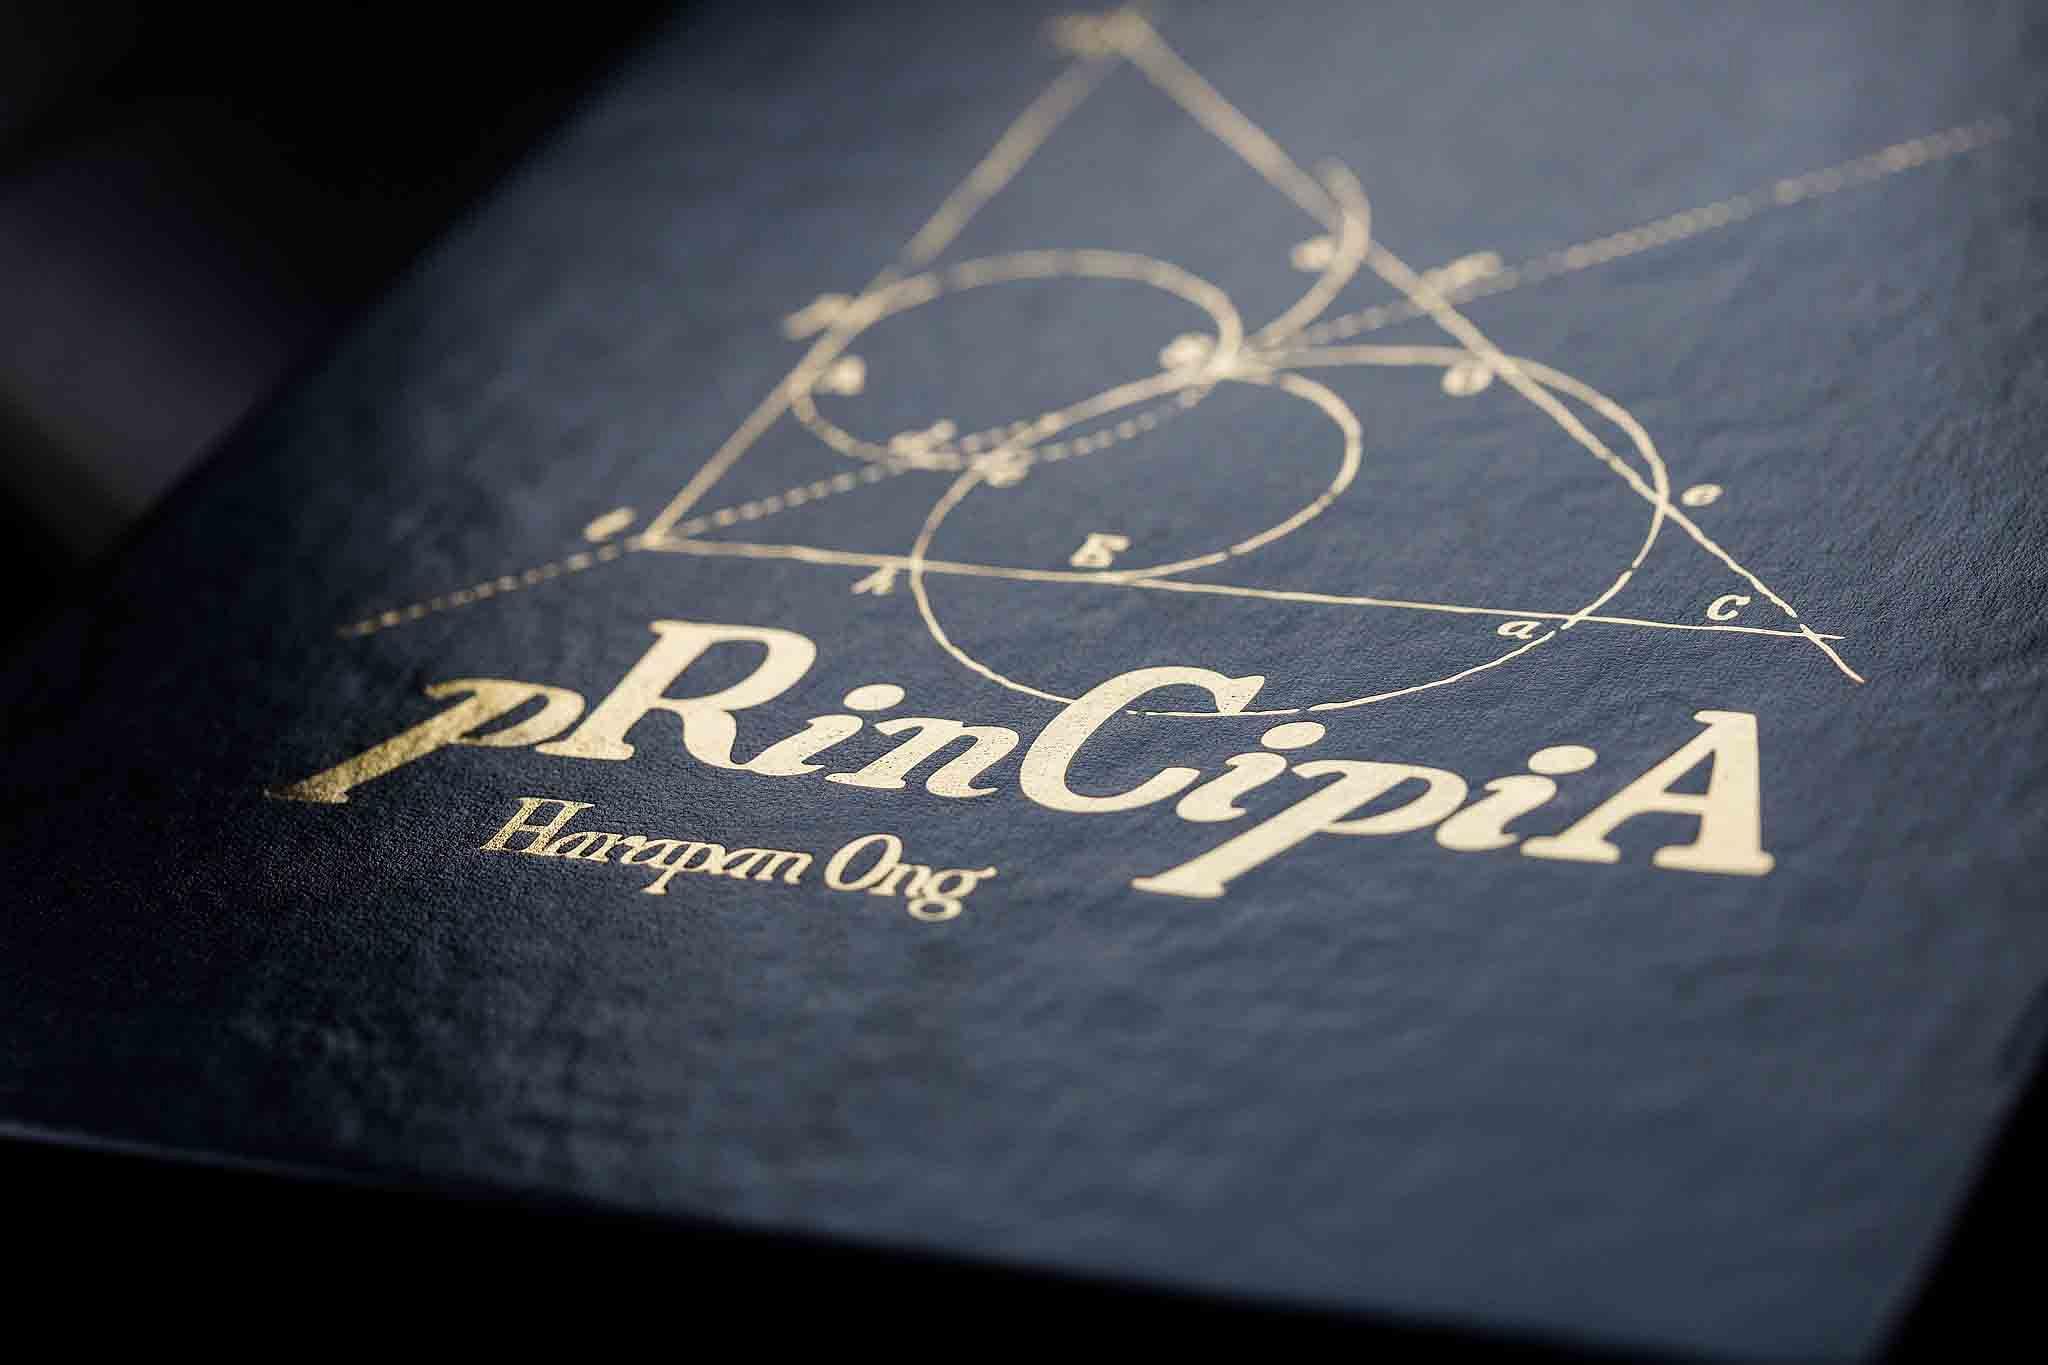 Principia - Deluxe Edition